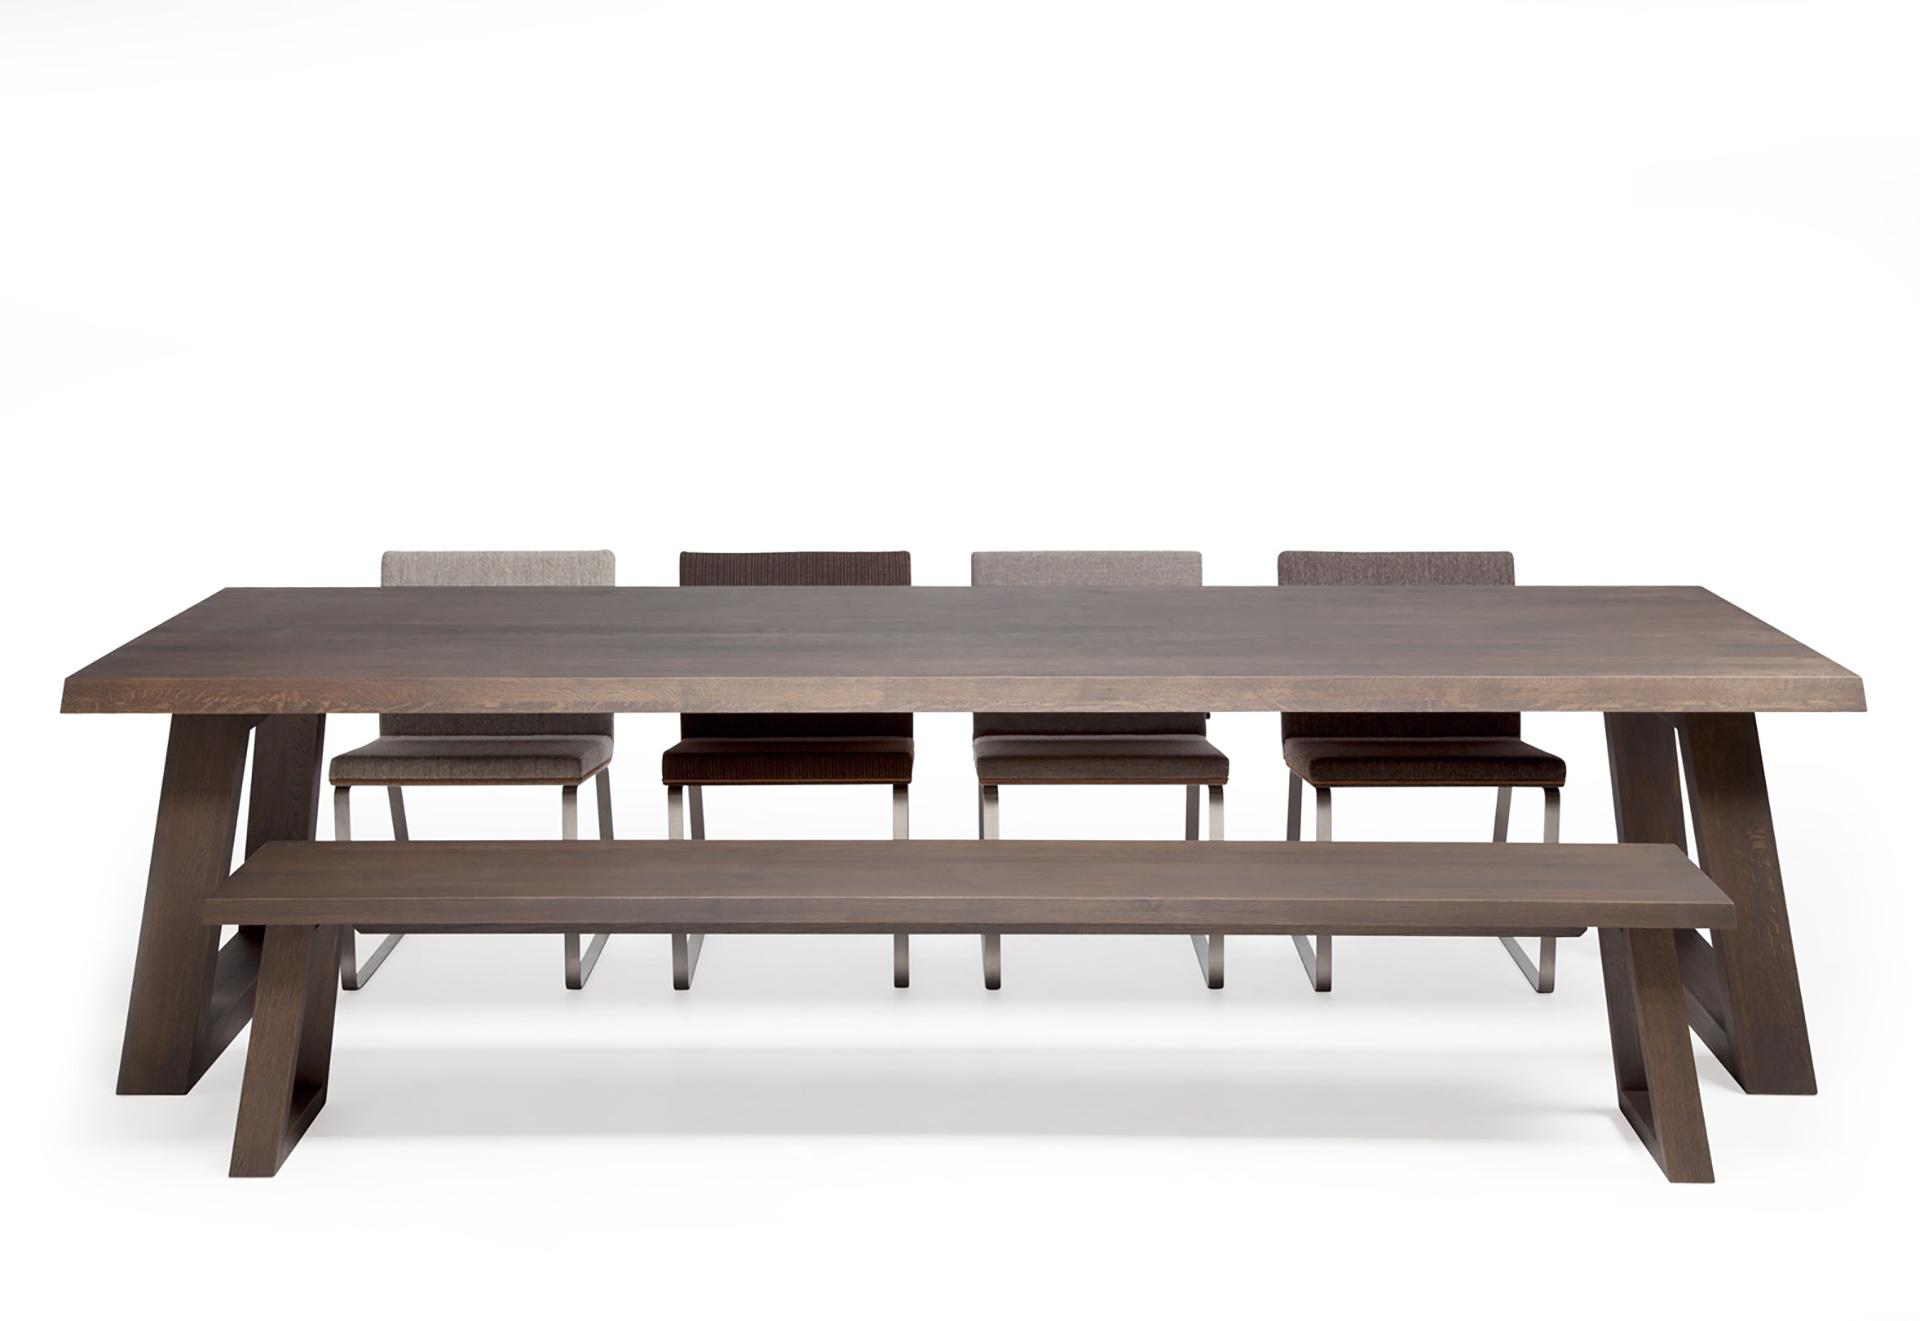 Dutch Design Tafel : Design dining table slide l remy meijers l odesi your dutch design